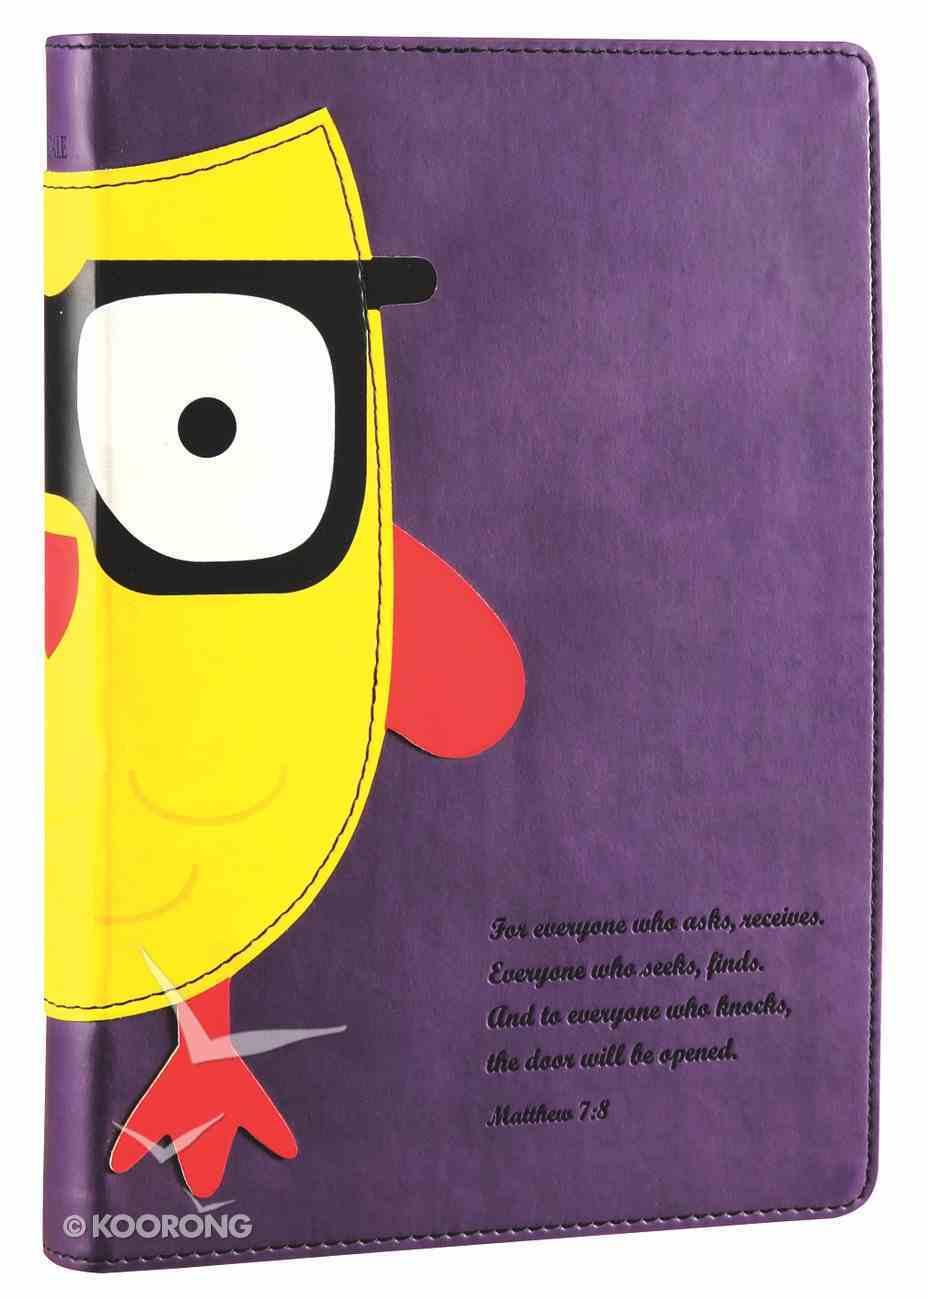 NLT Kids Slimline Bible Matthew 7: 8 Purple/Yellow Owl Wisdom (Black Letter Edition) Imitation Leather